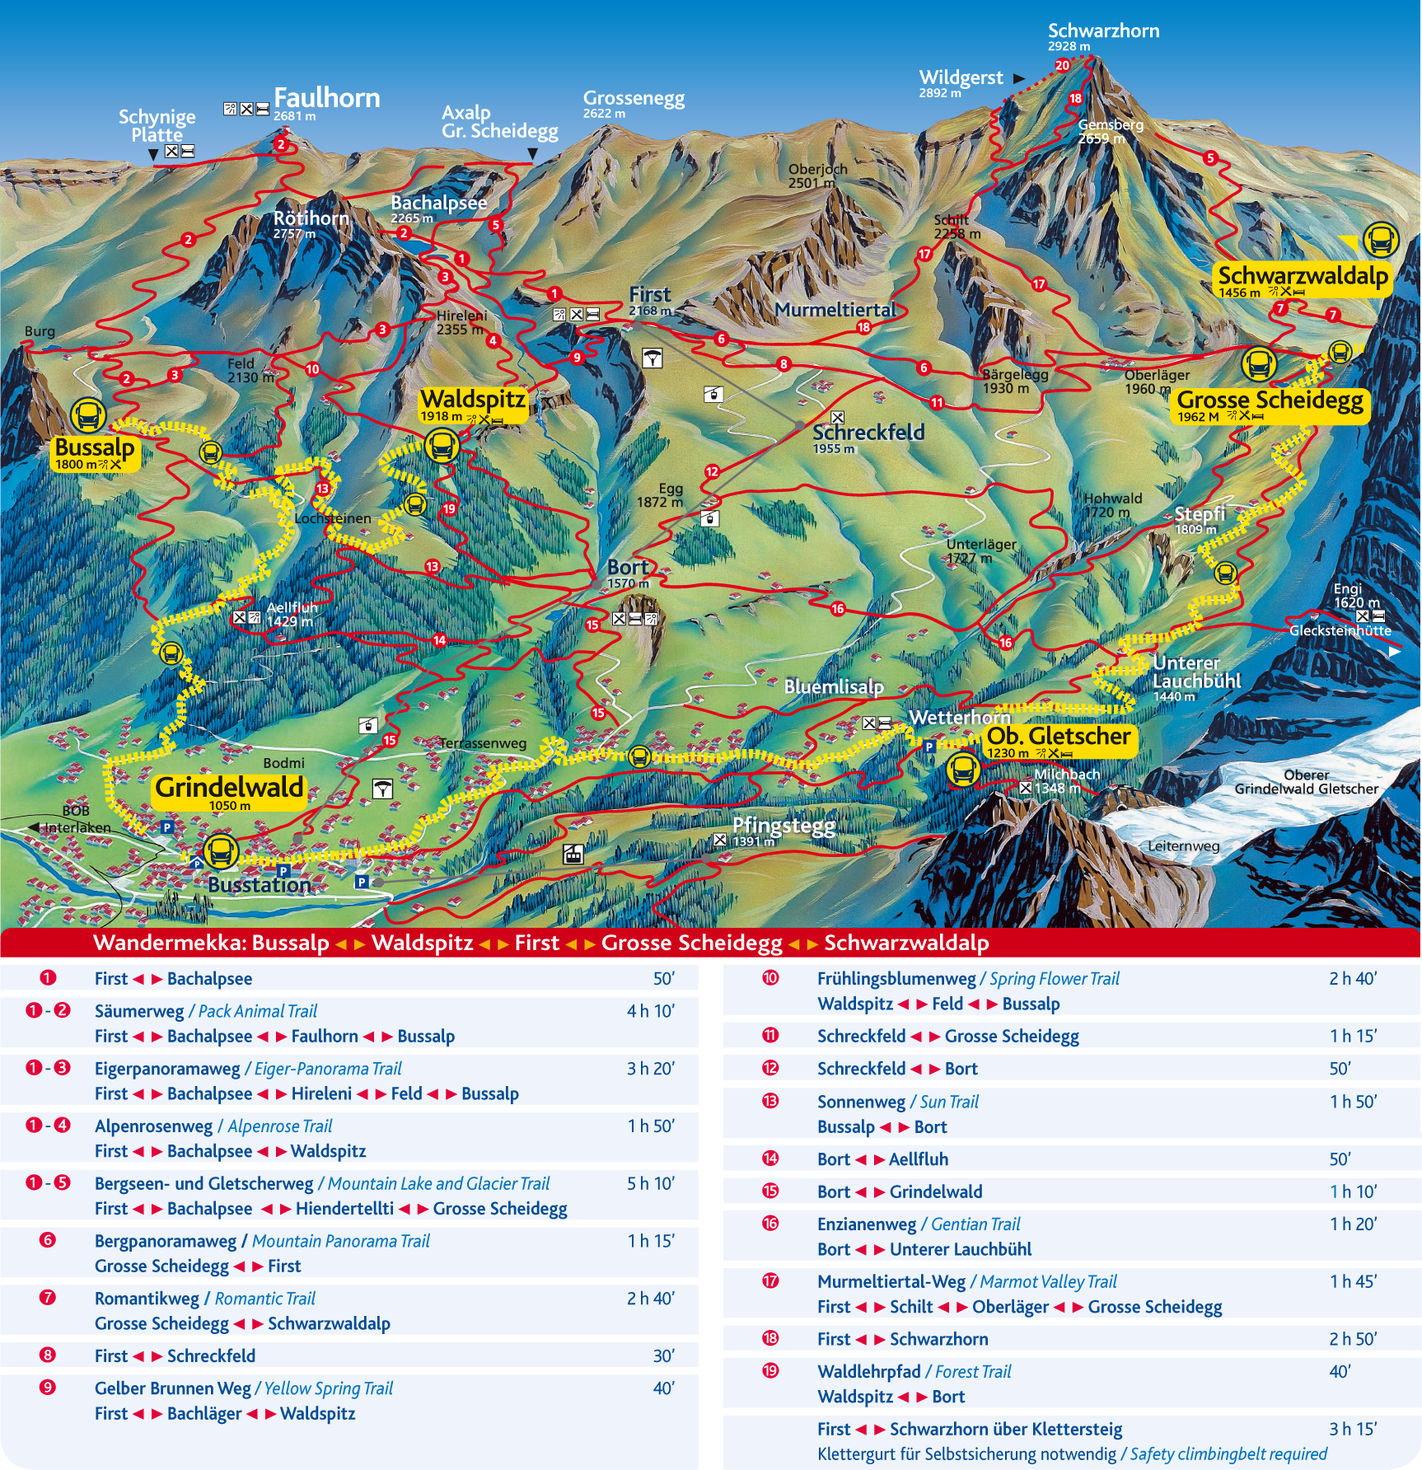 Karte Wandern